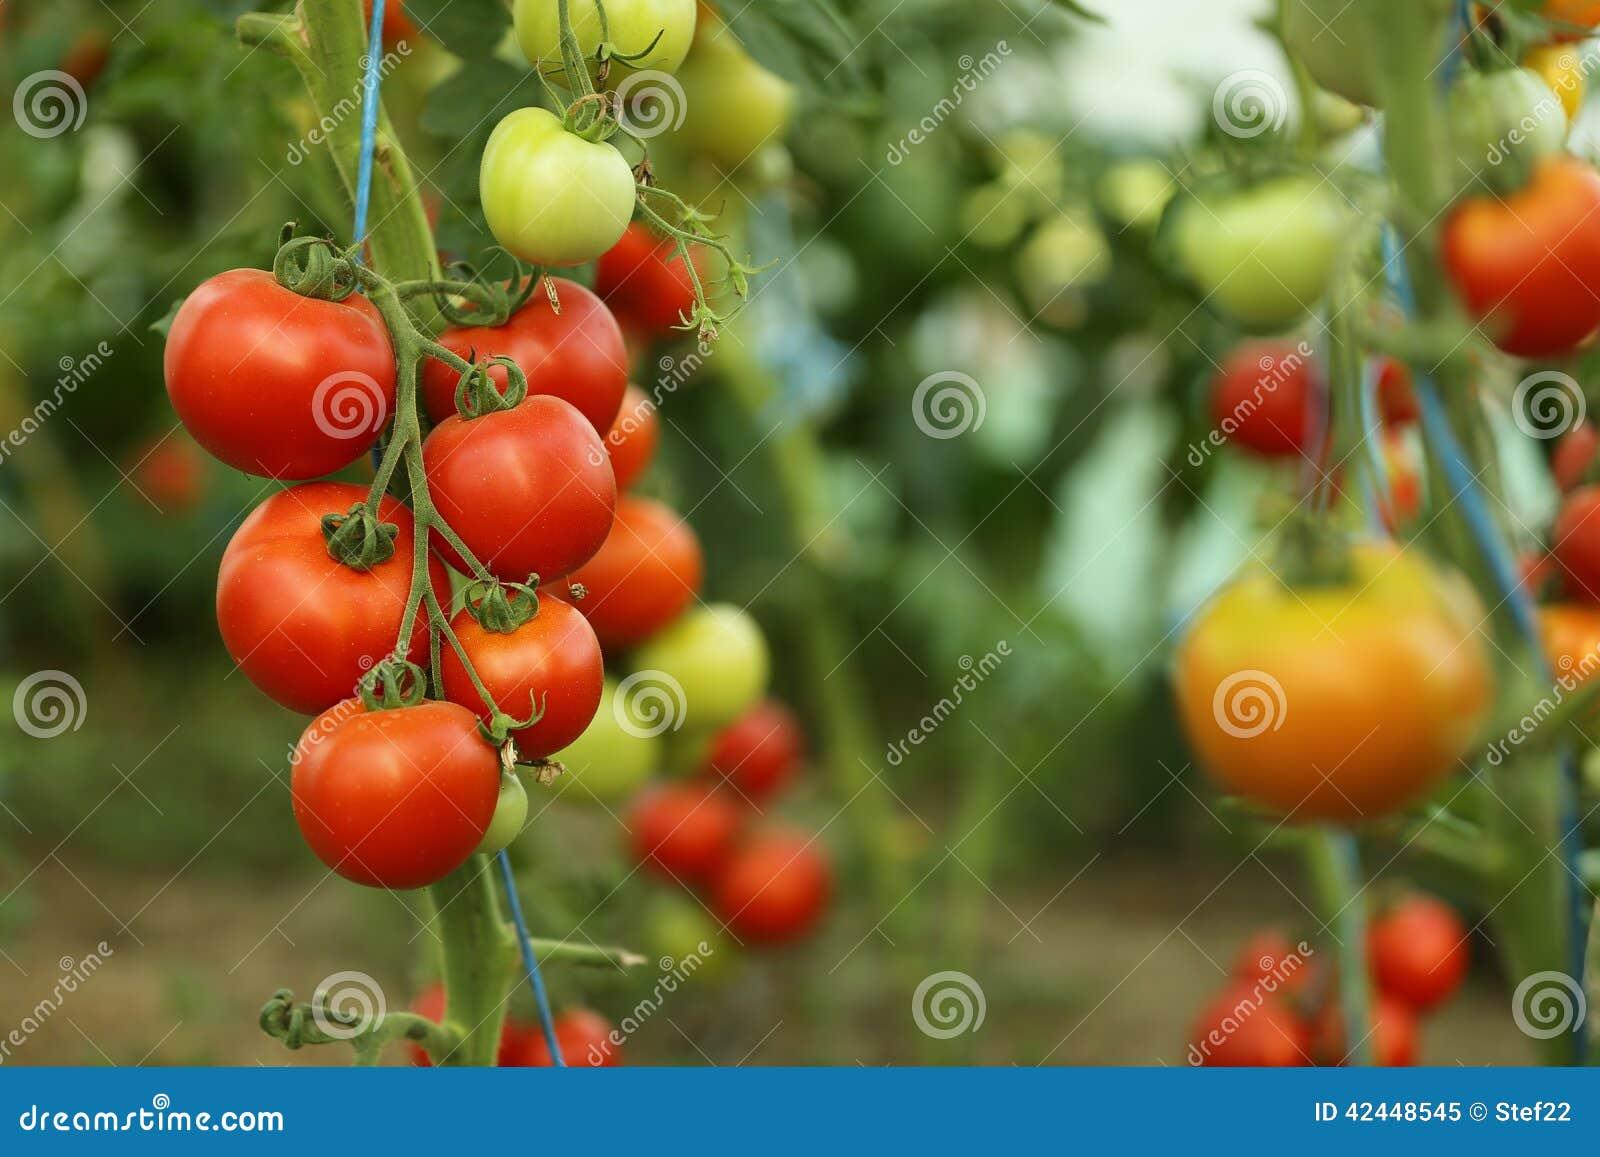 Colheita de tomate